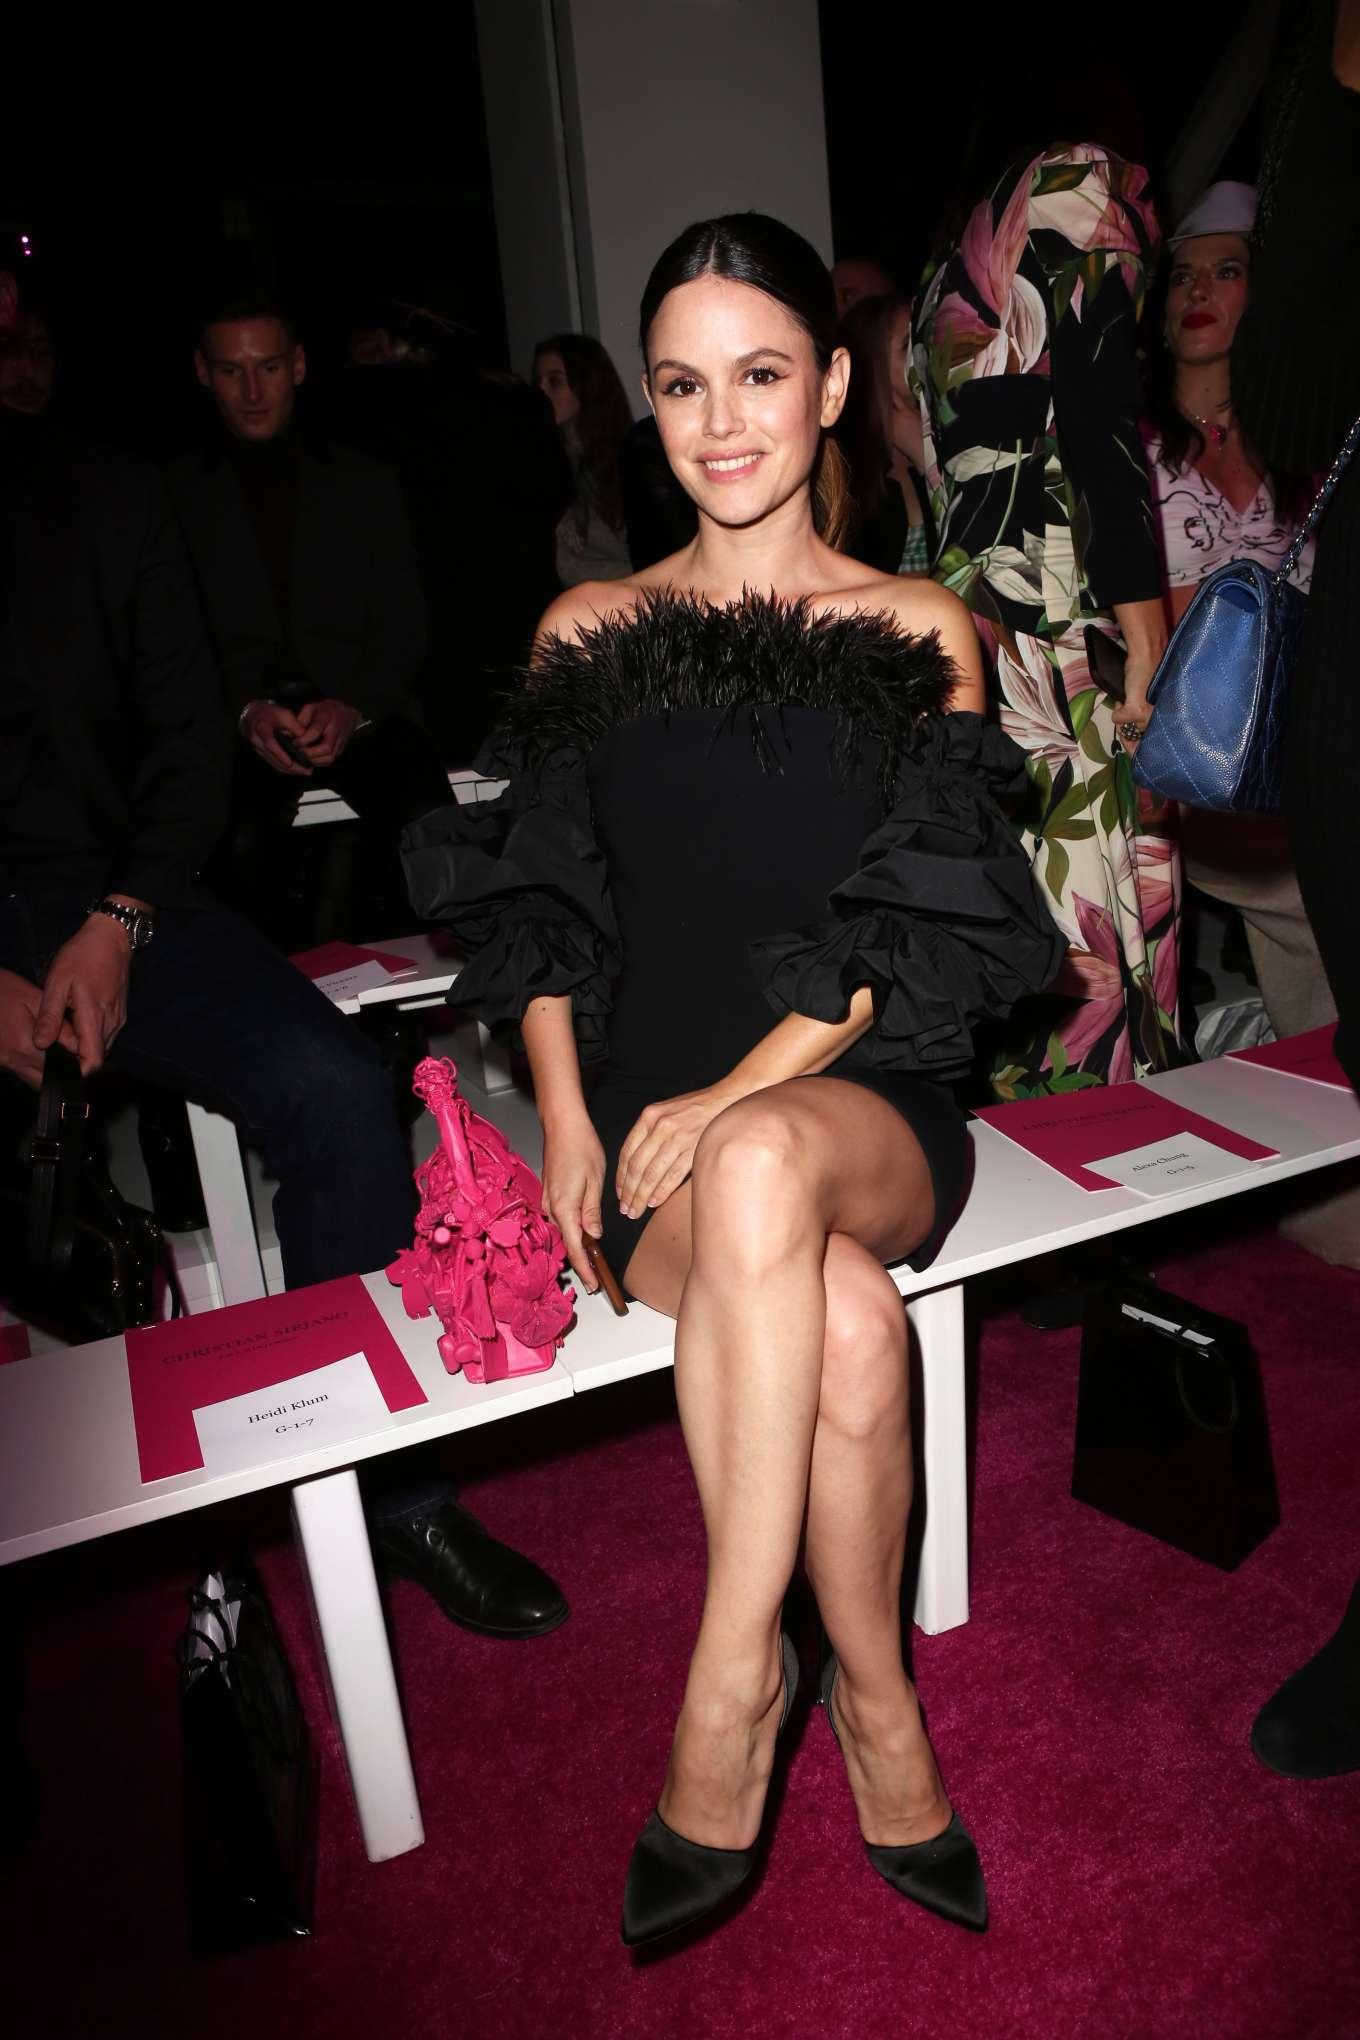 Rachel Bilson 2020 : Rachel Bilson – Christian Siriano Show at New York Fashion Week 2020-01